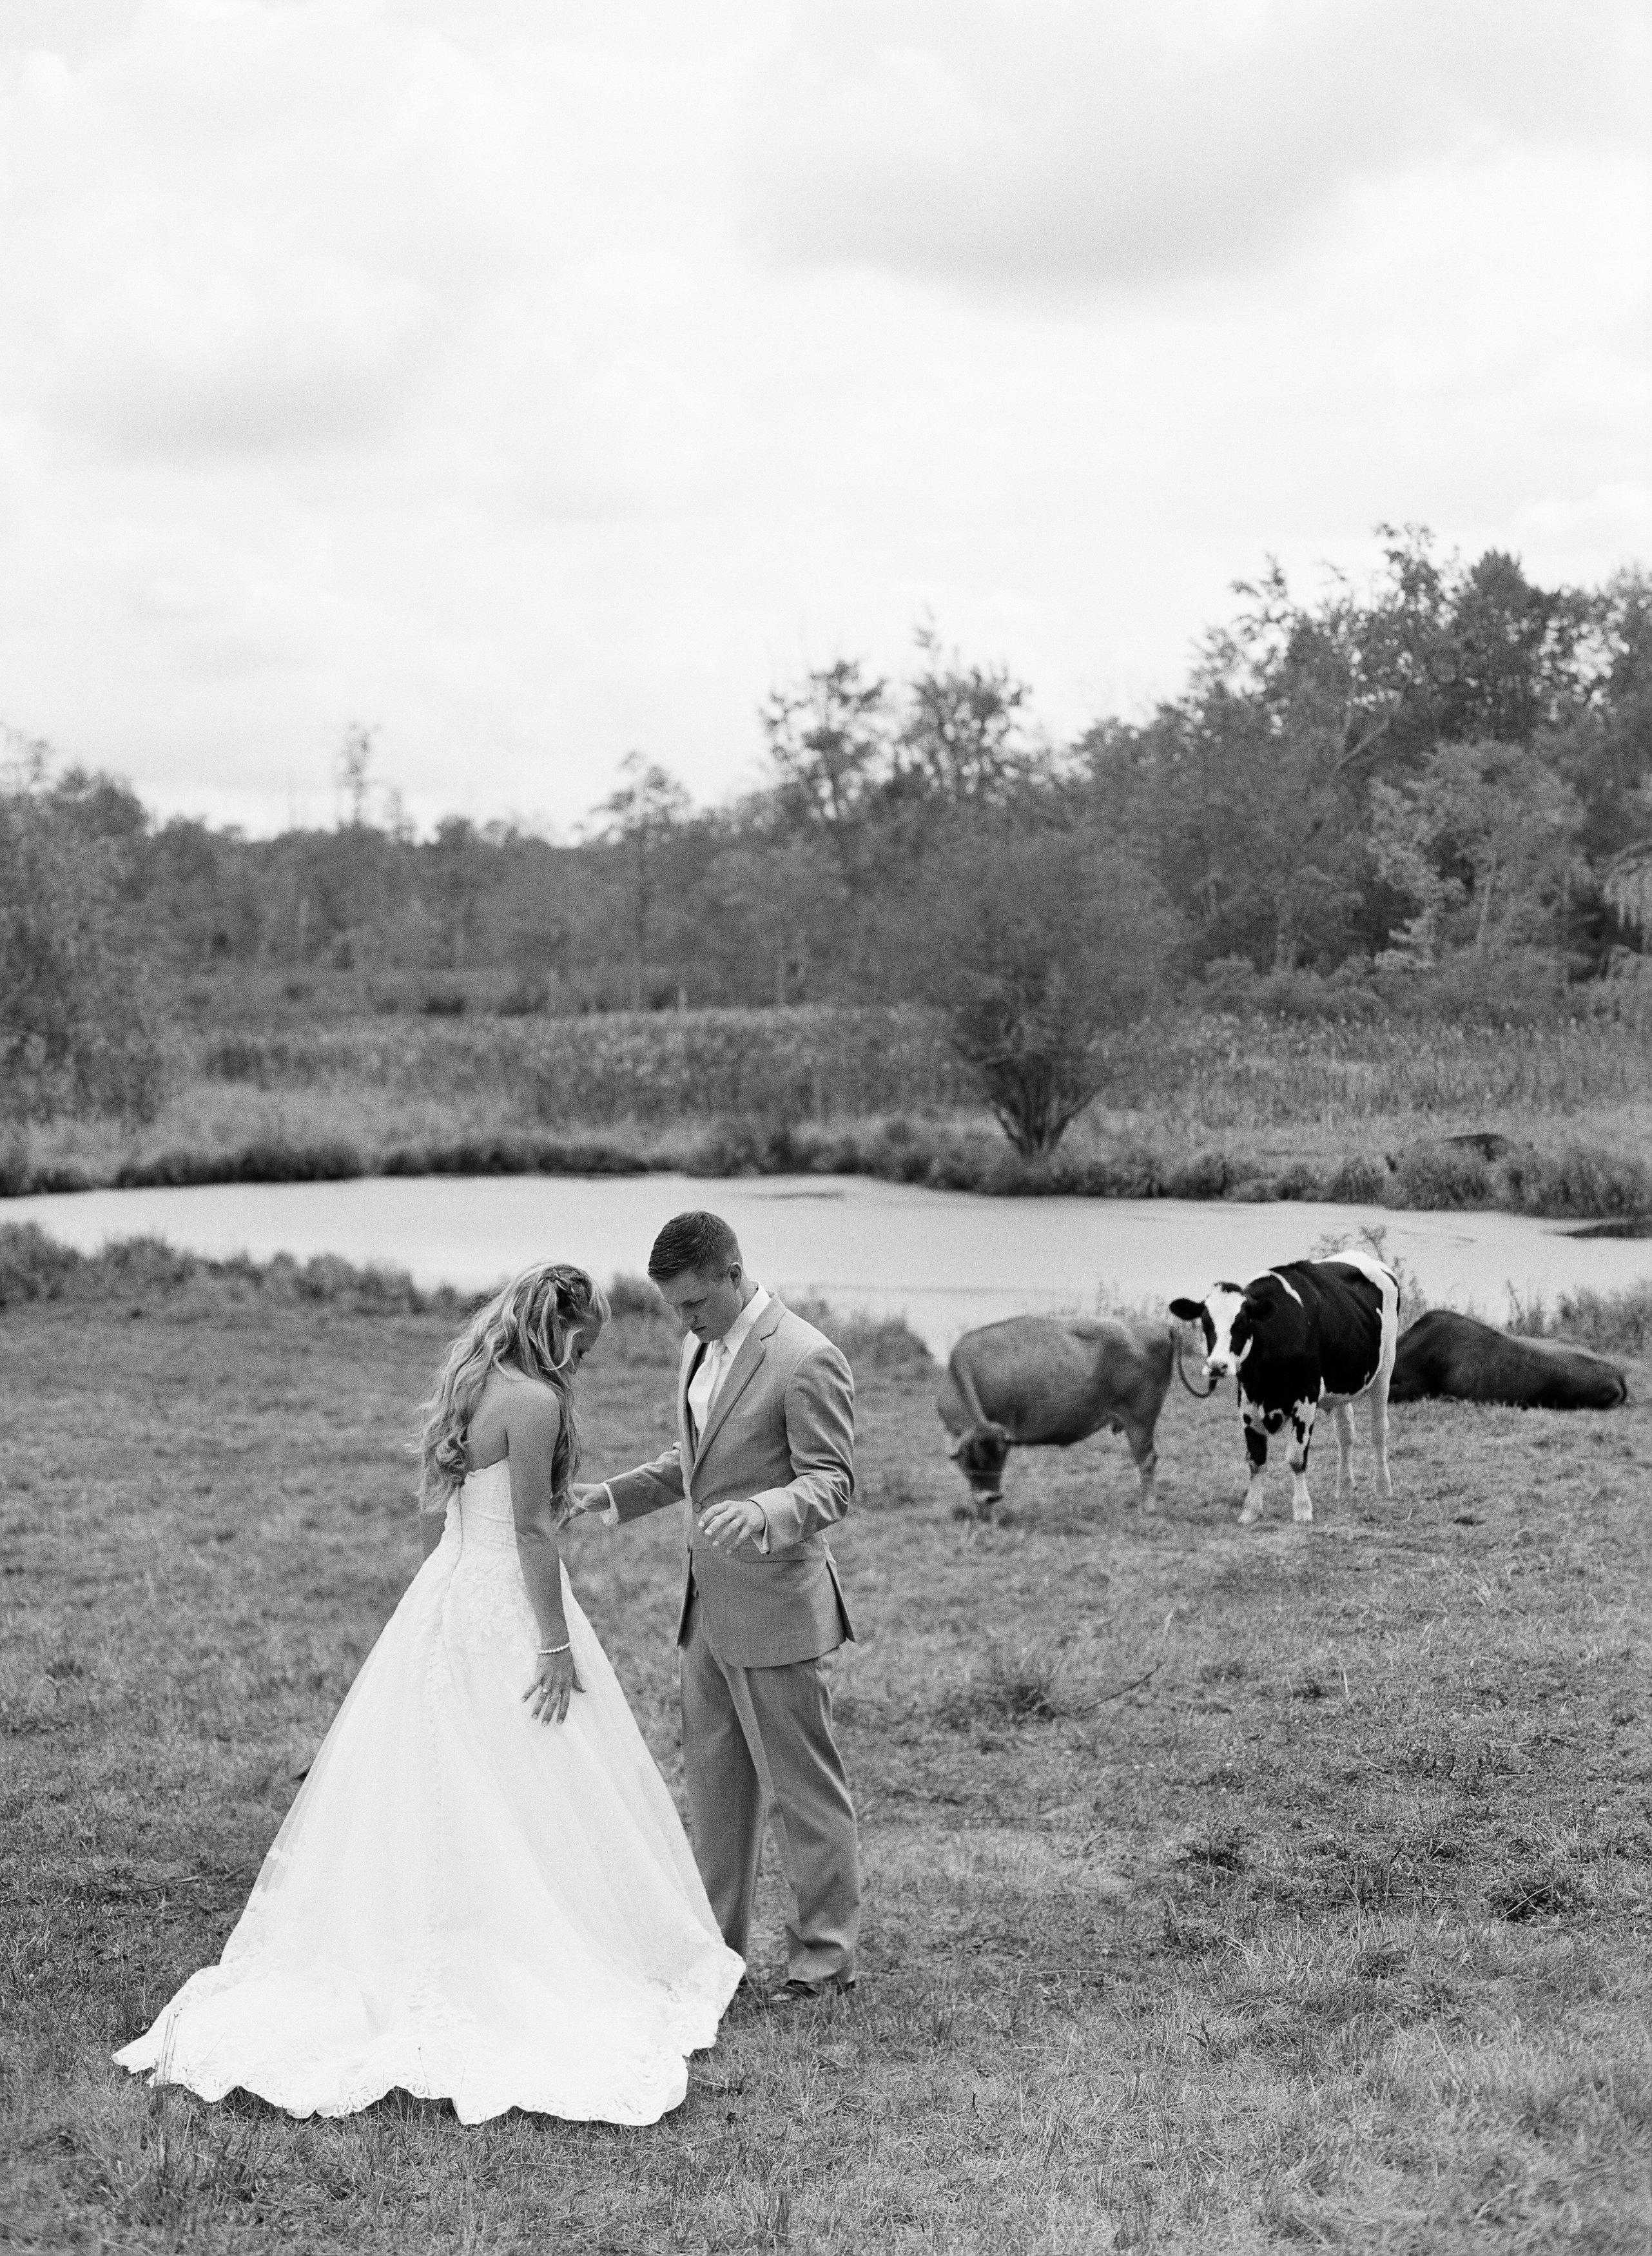 Stephanie&Dan-Wedding-LindsayMaddenPhotographyII-49